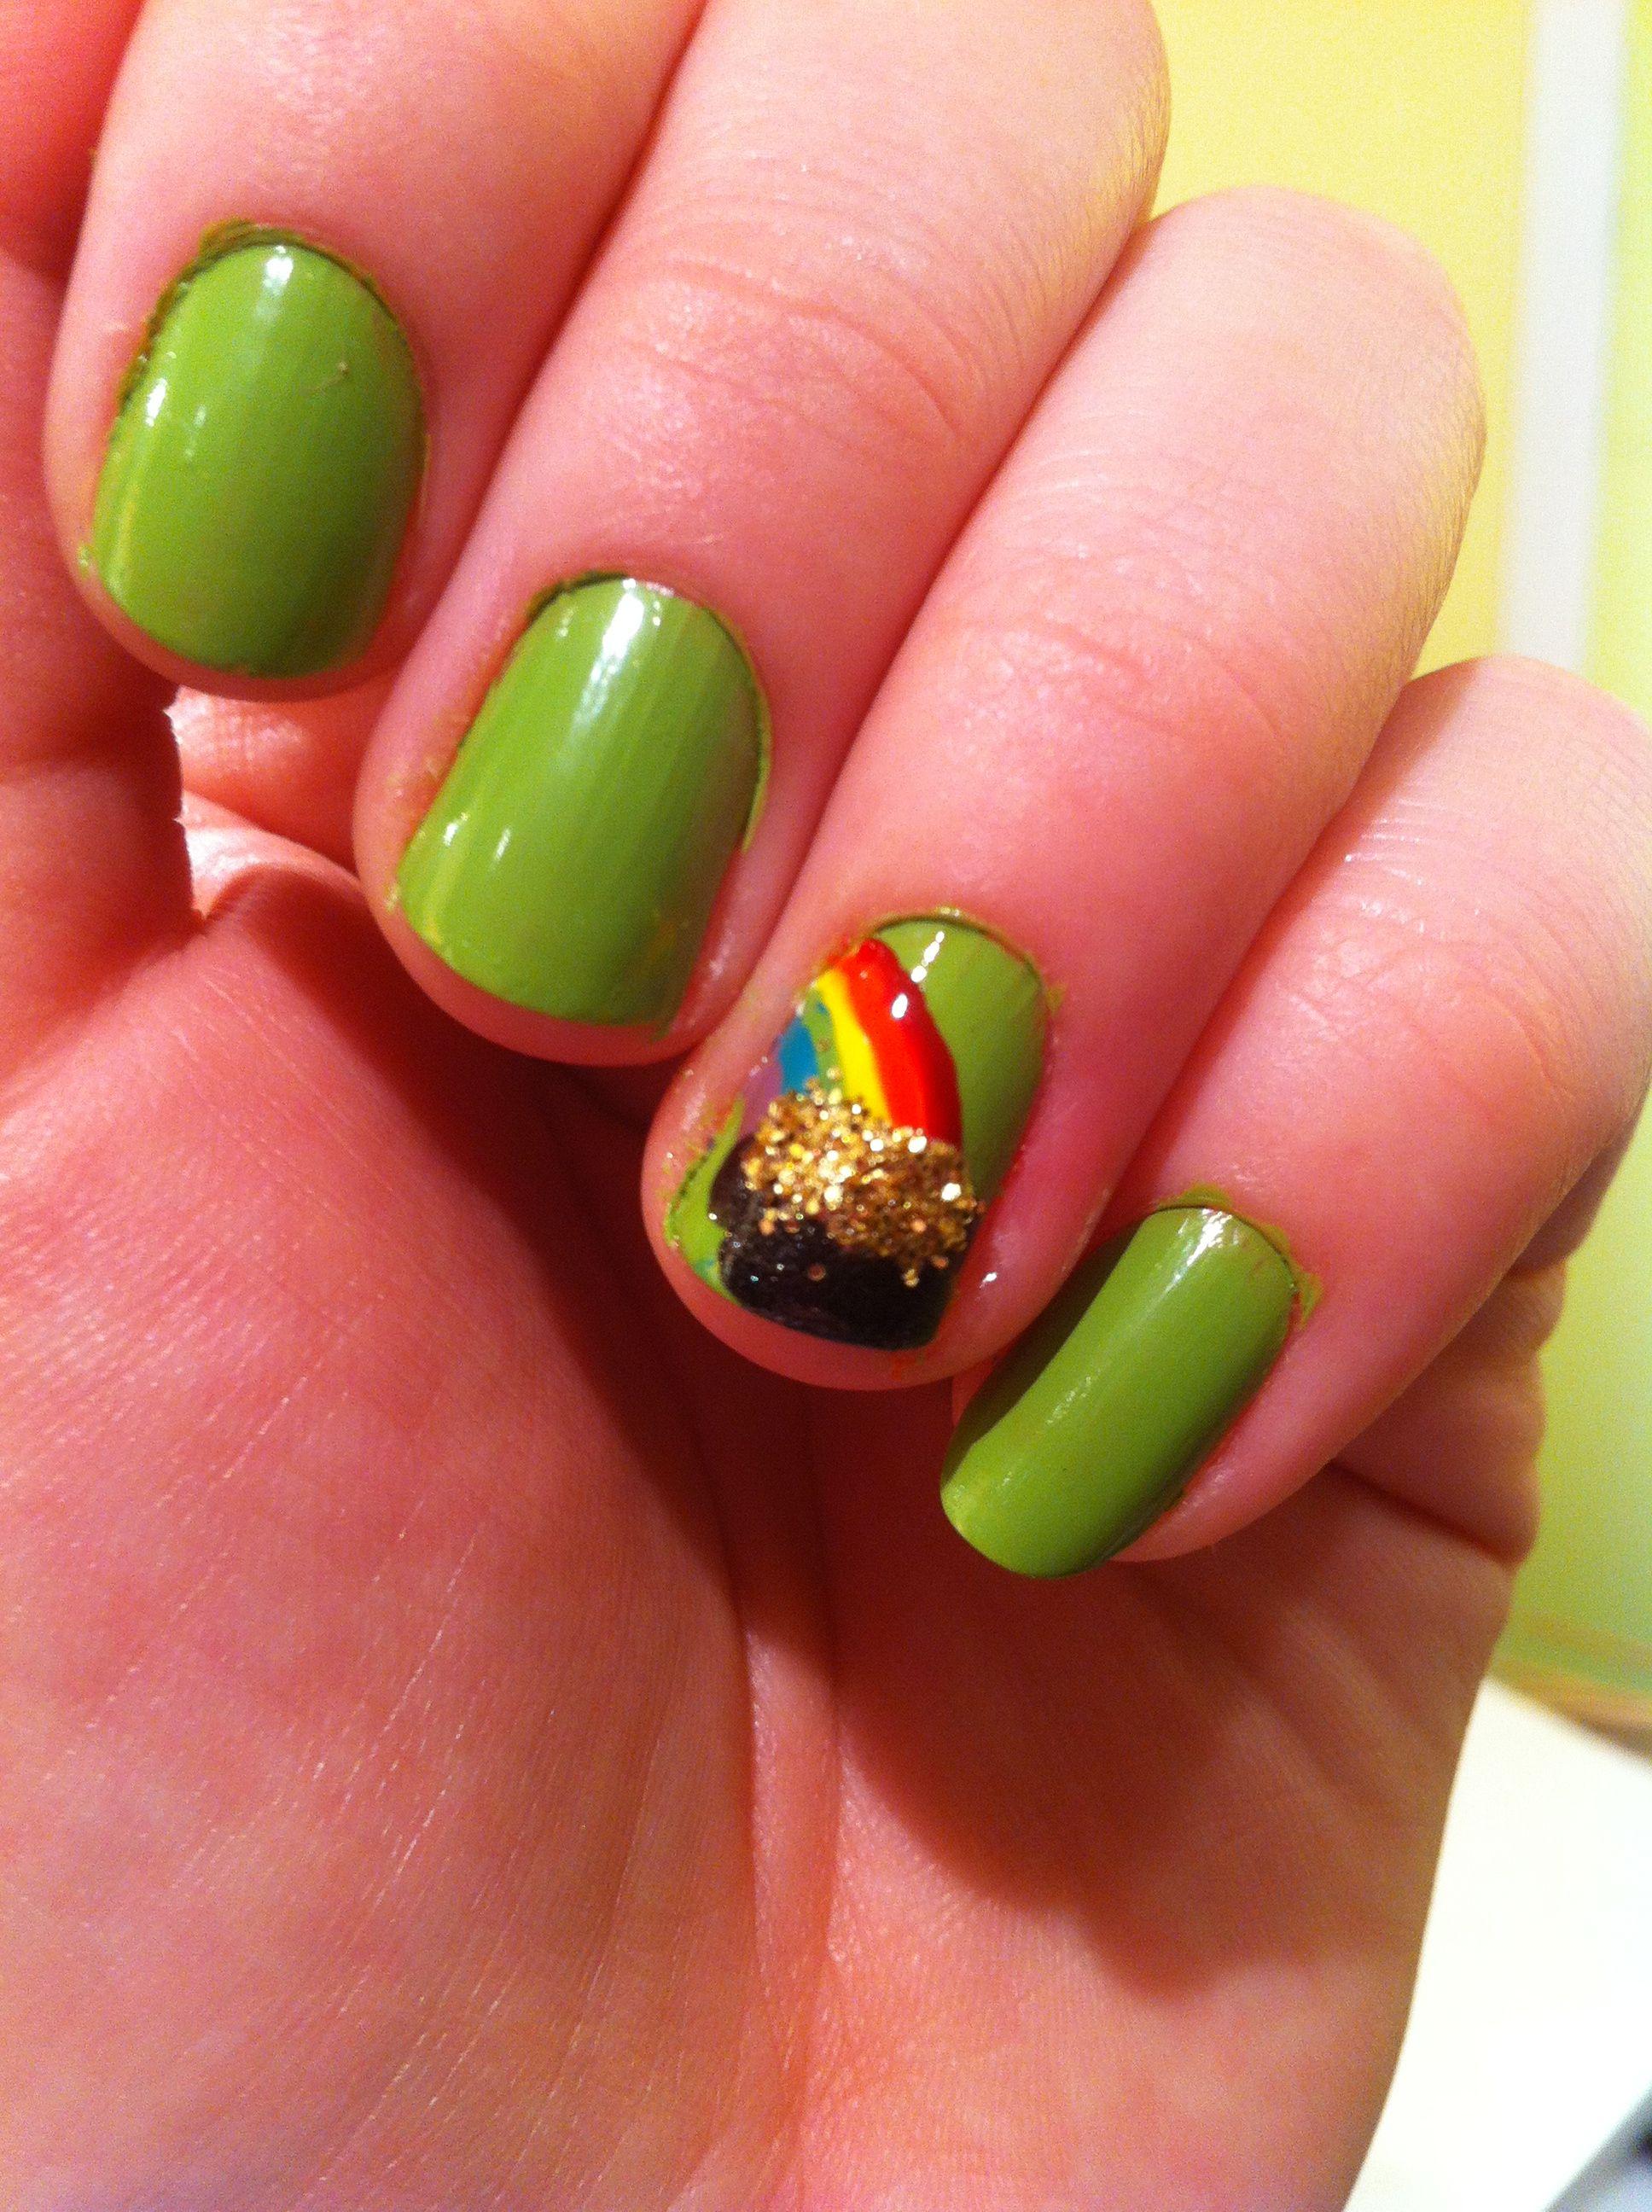 My St. Patrick\'s Day 2013 nail design. By Vicky Van Roie | Nails ...